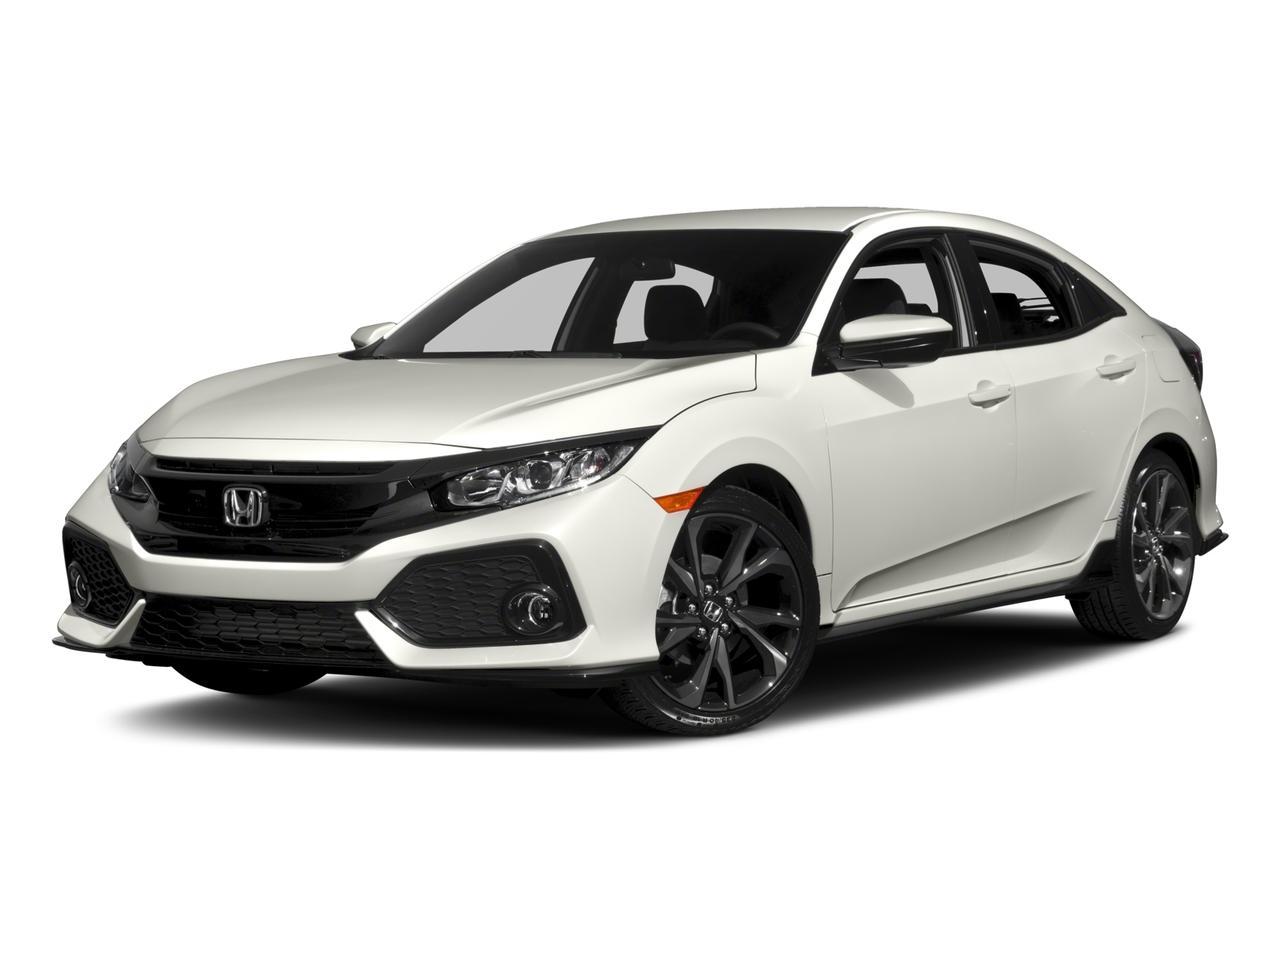 2017 Honda Civic Hatchback Vehicle Photo in Appleton, WI 54913